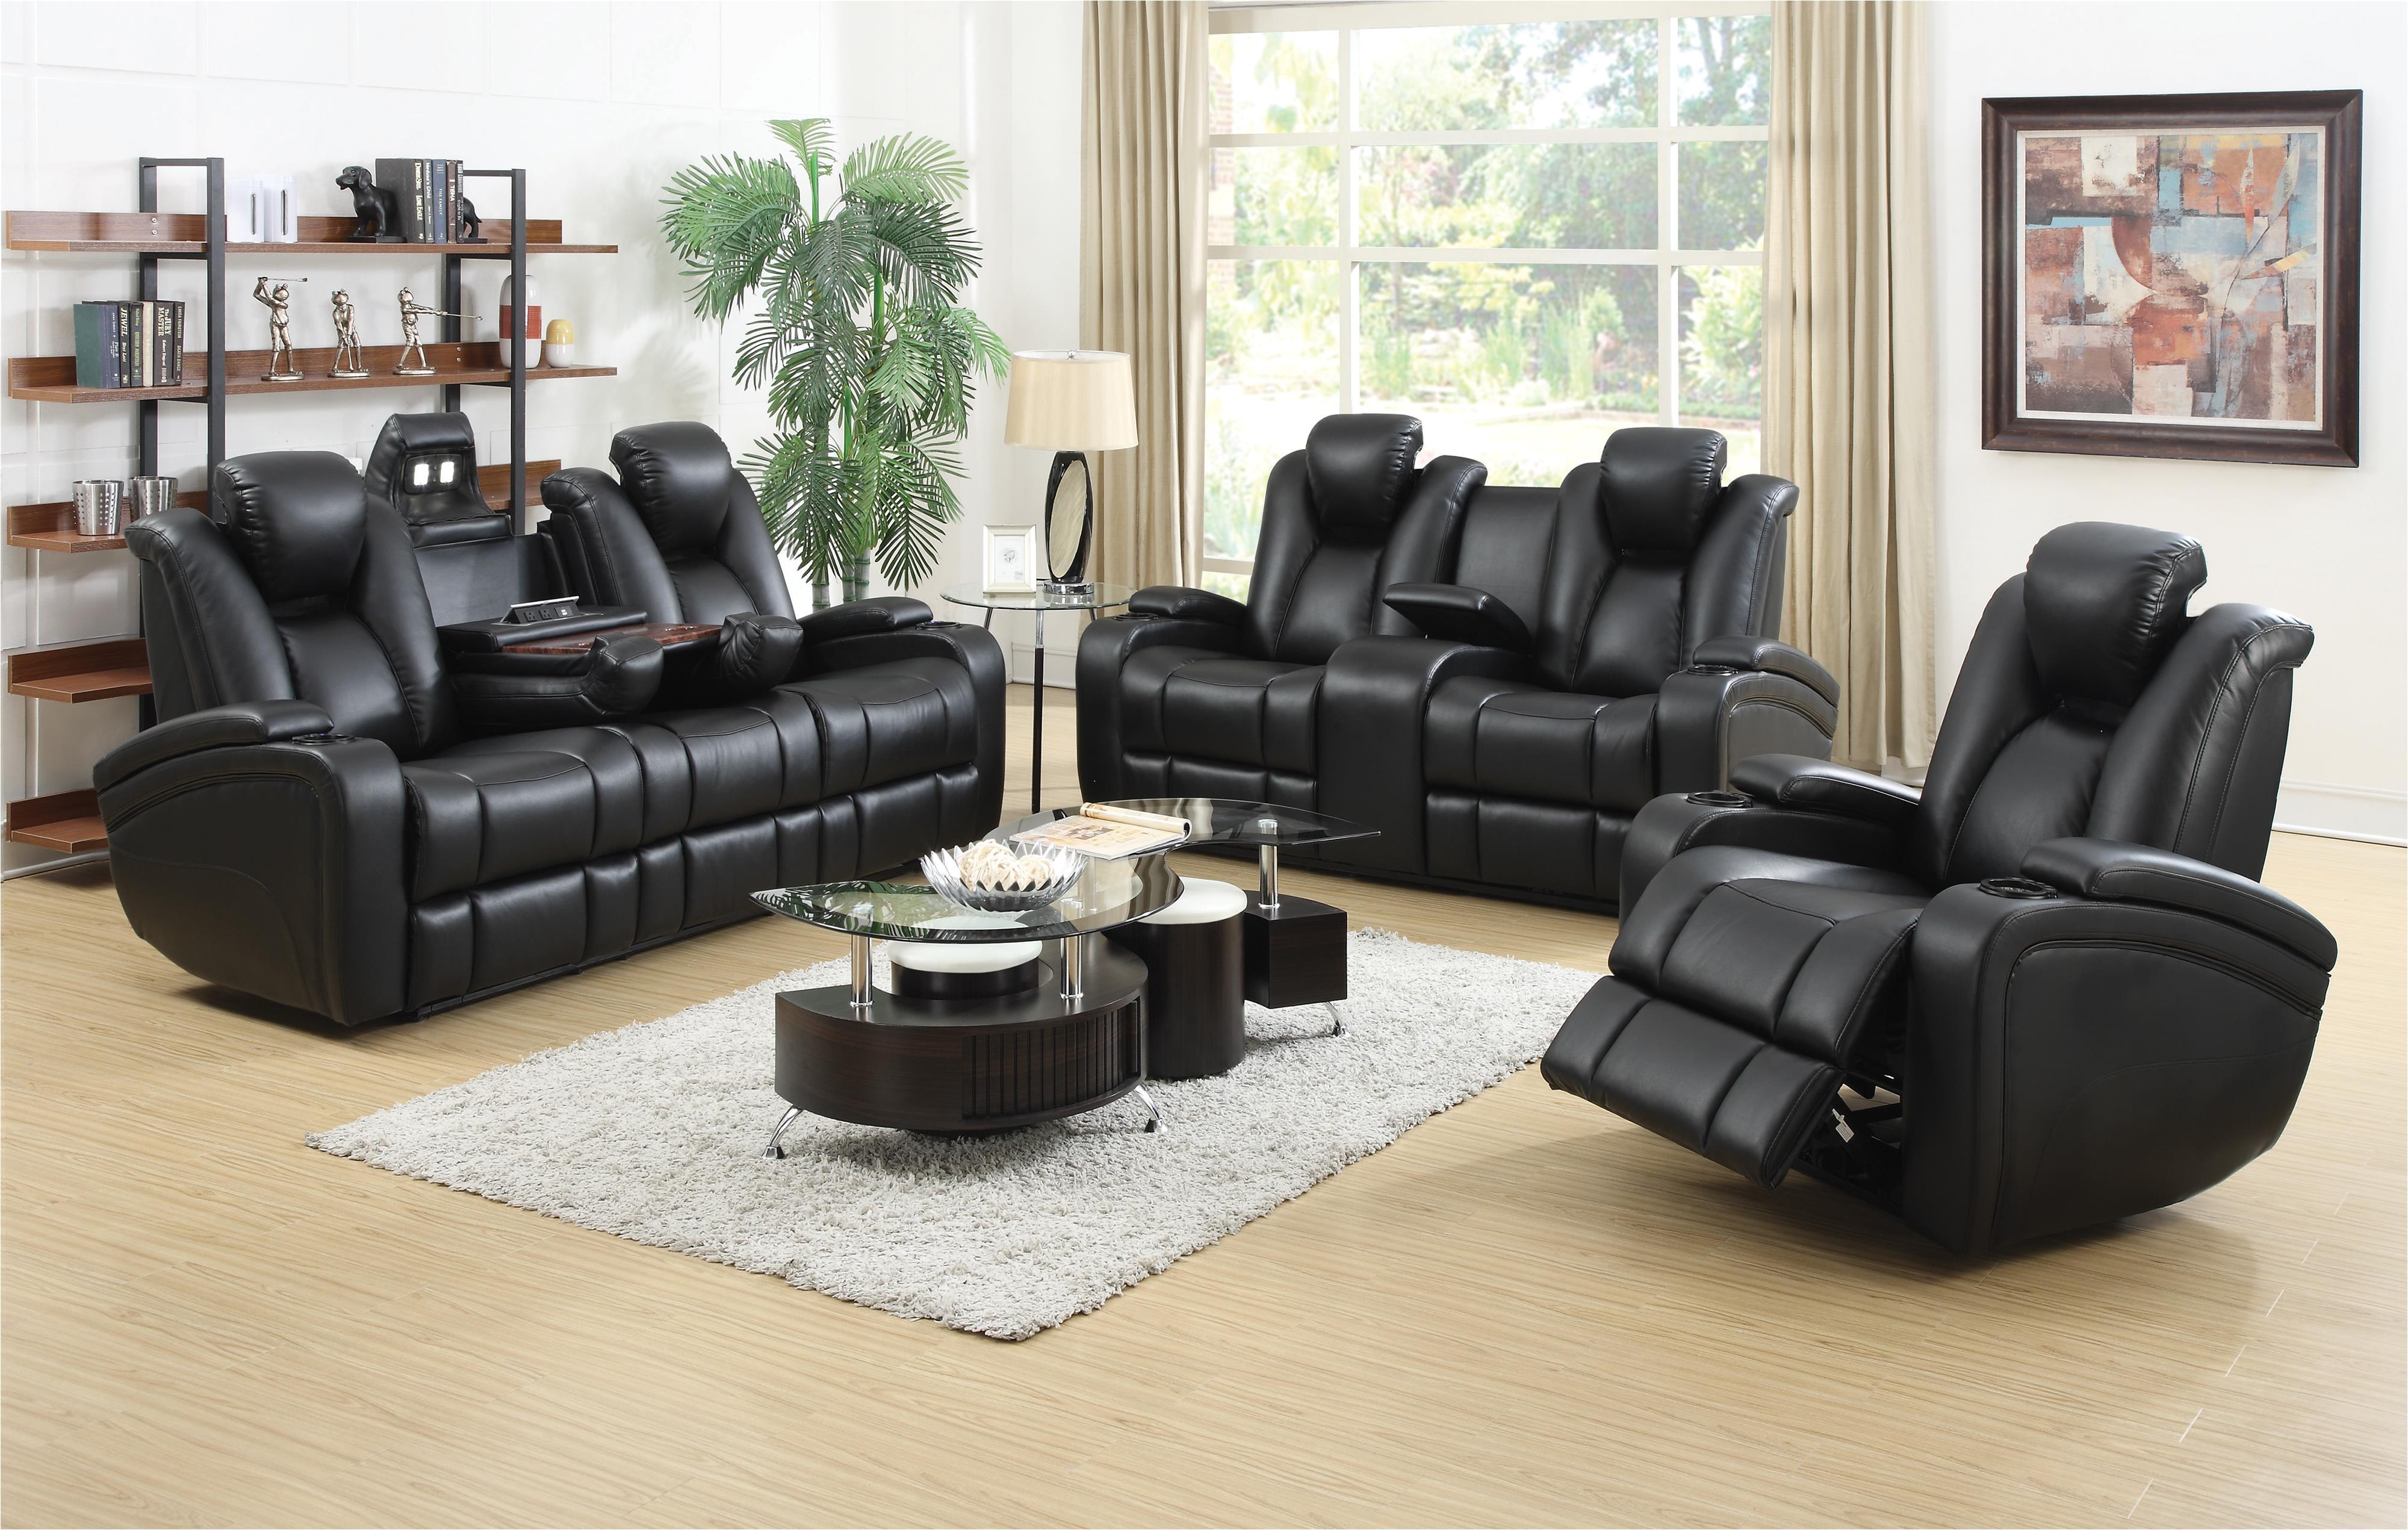 coaster delange 601741p power sofa northeast factory direct reclining sofa cleveland eastlake westlake mentor medina ohio